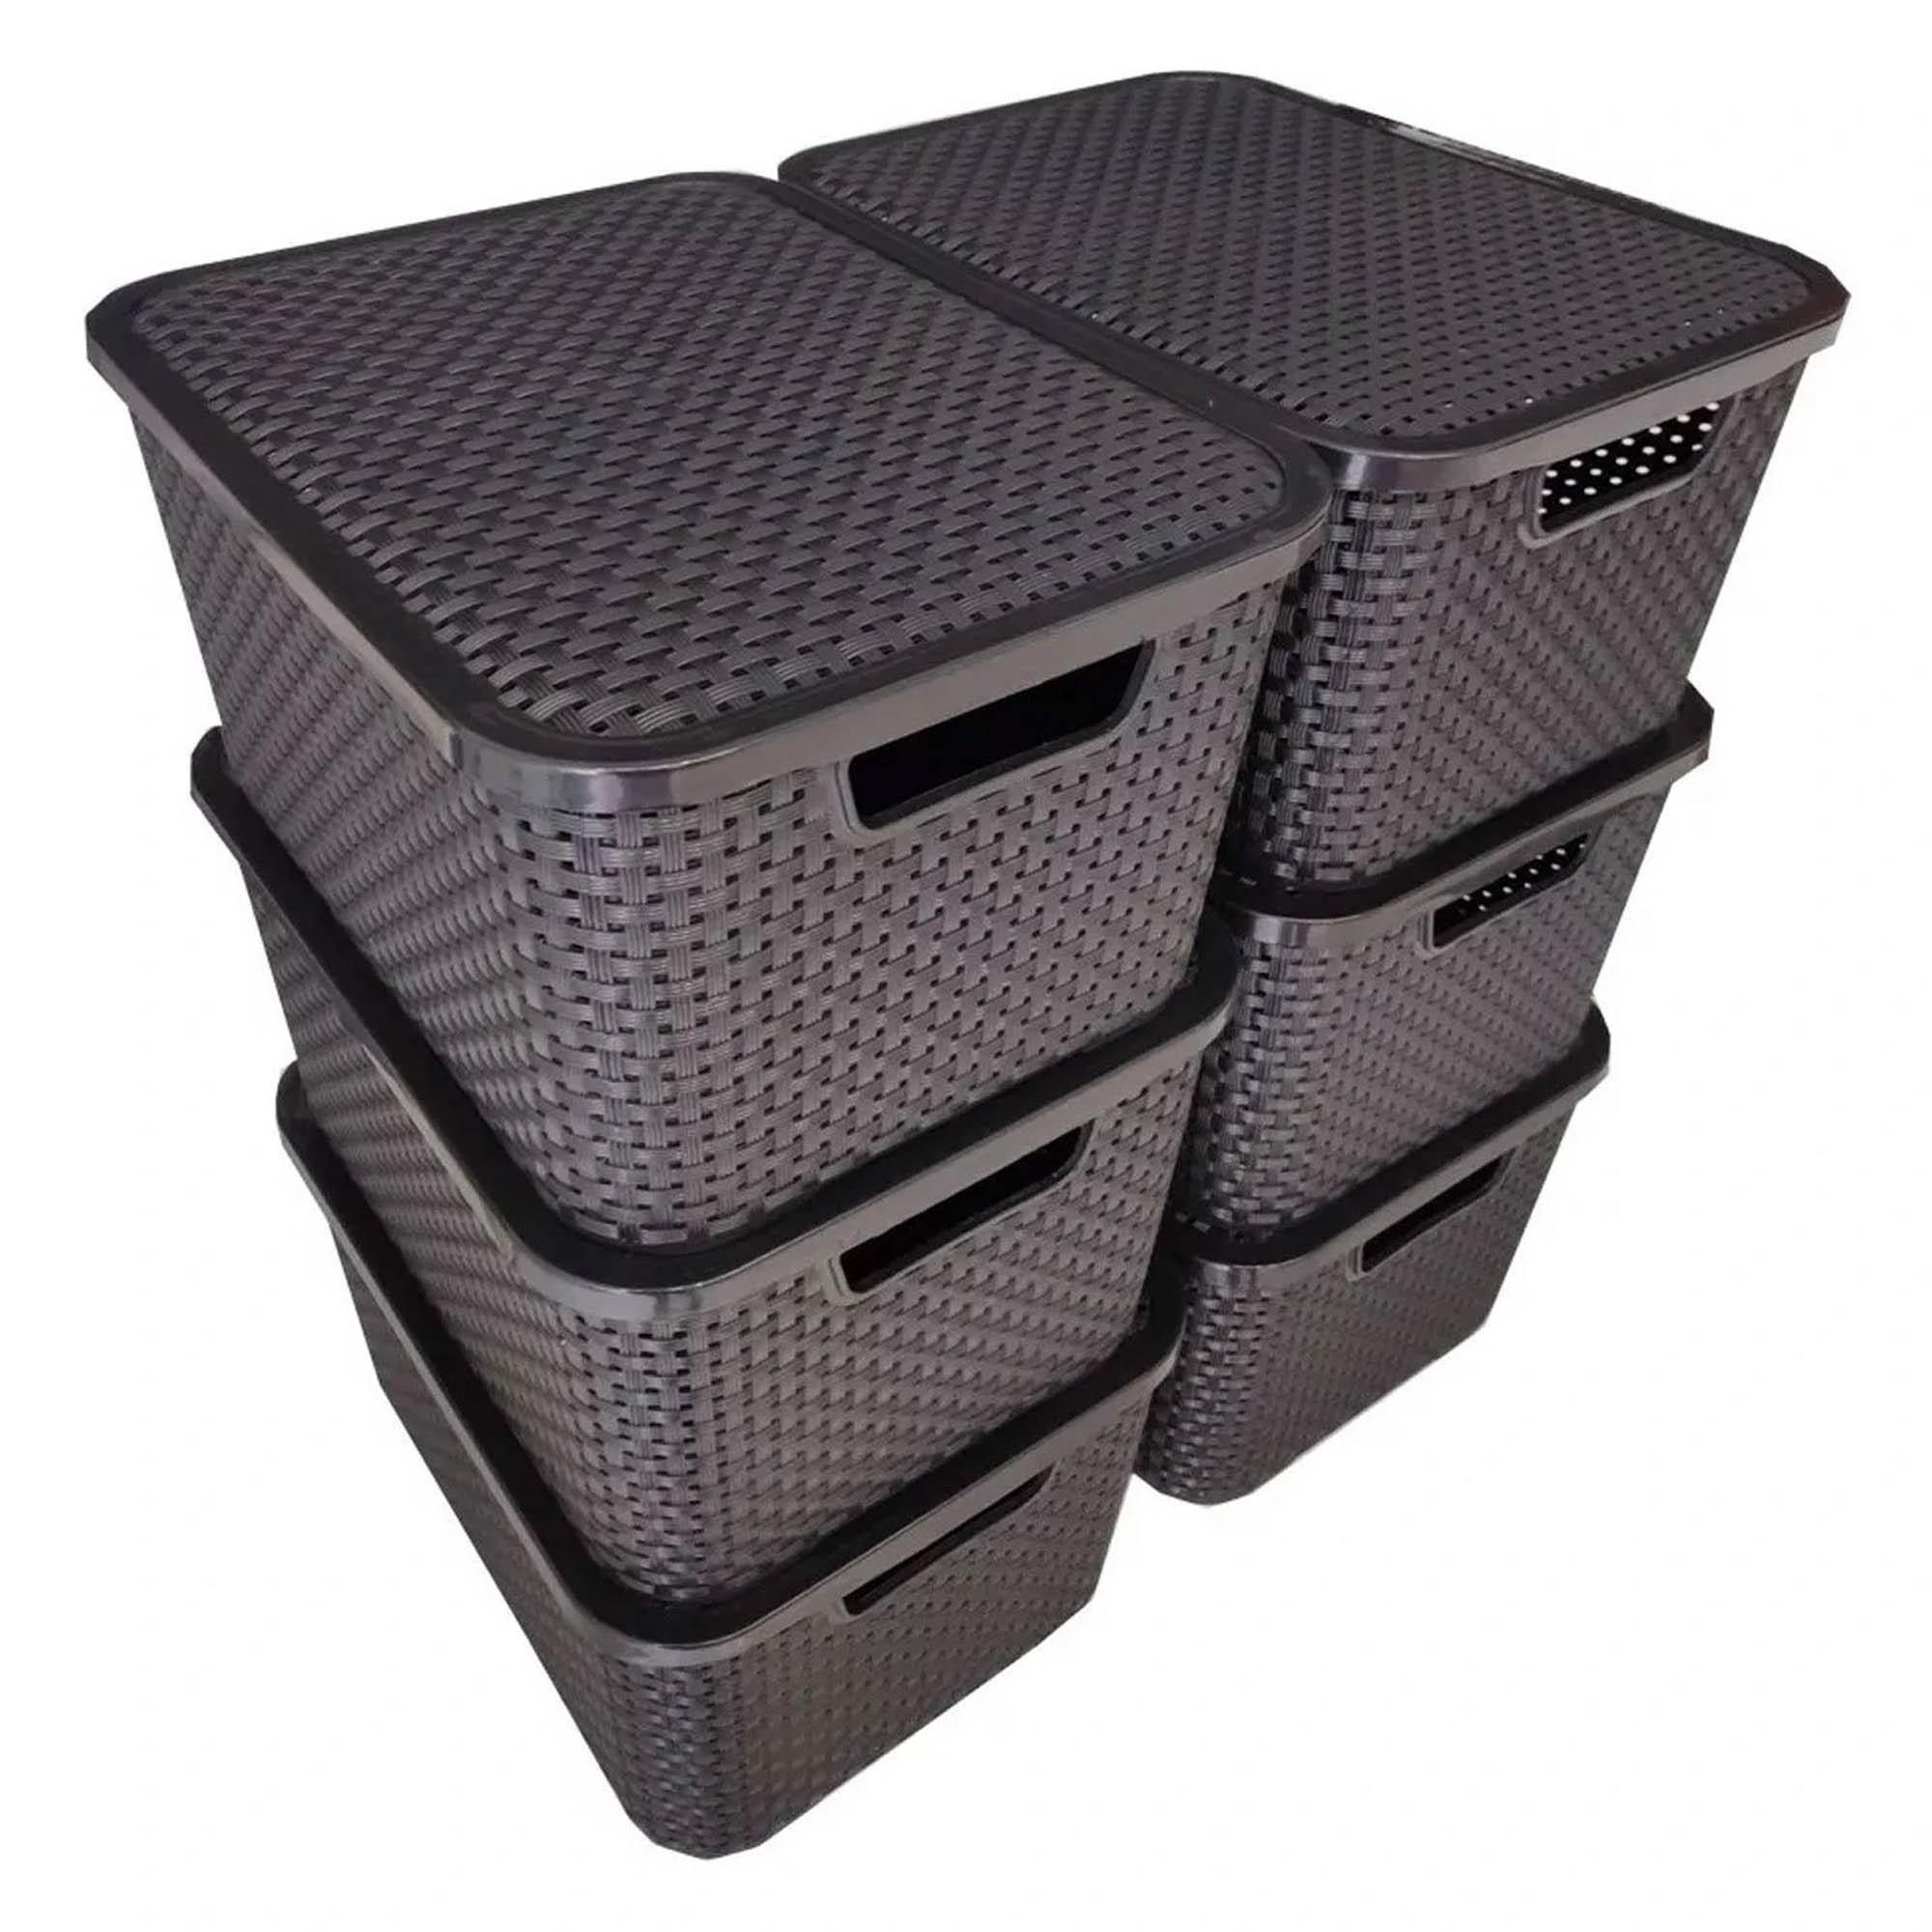 4 x Caixa Organizadora Plástica Cesto Rattan 40 L Com Tampa